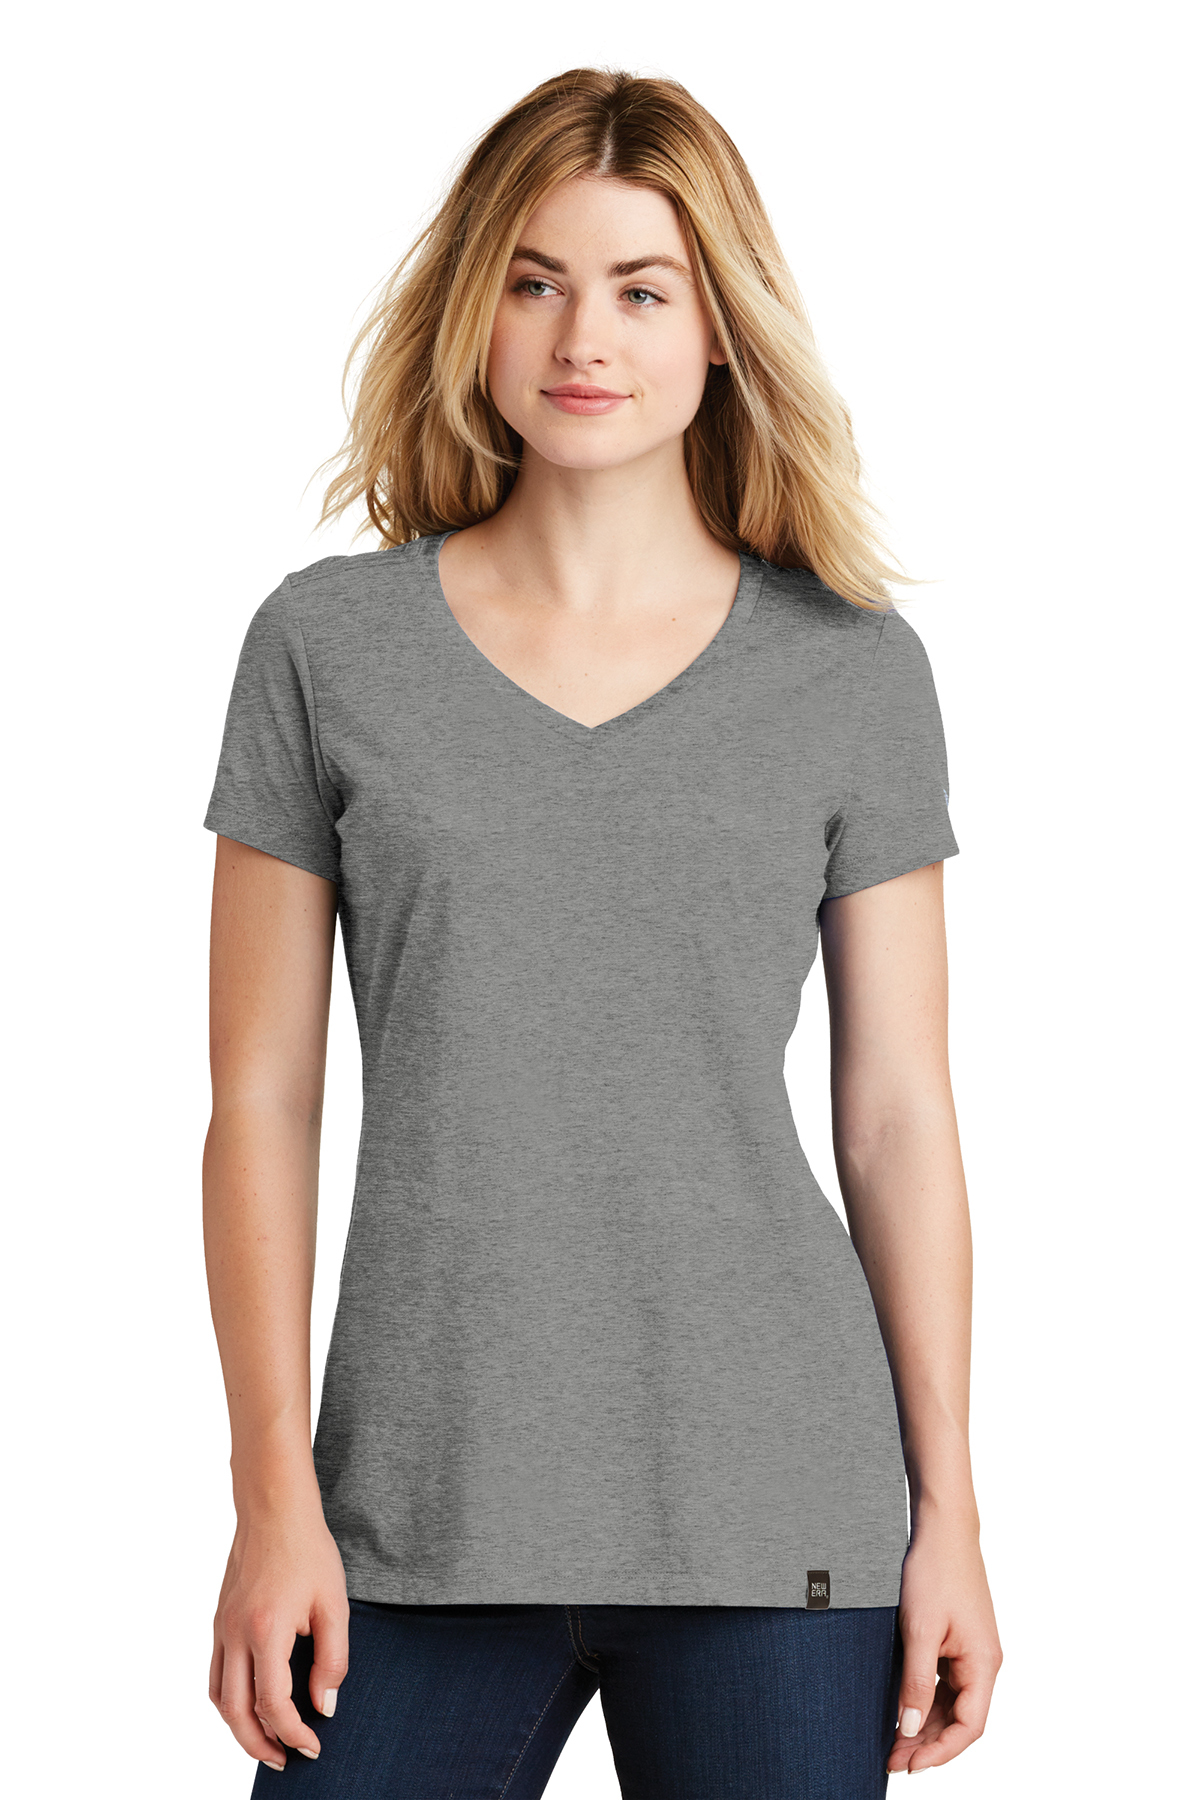 9424cc96e New Era® Ladies Heritage Blend V-Neck Tee | T-Shirts | SanMar